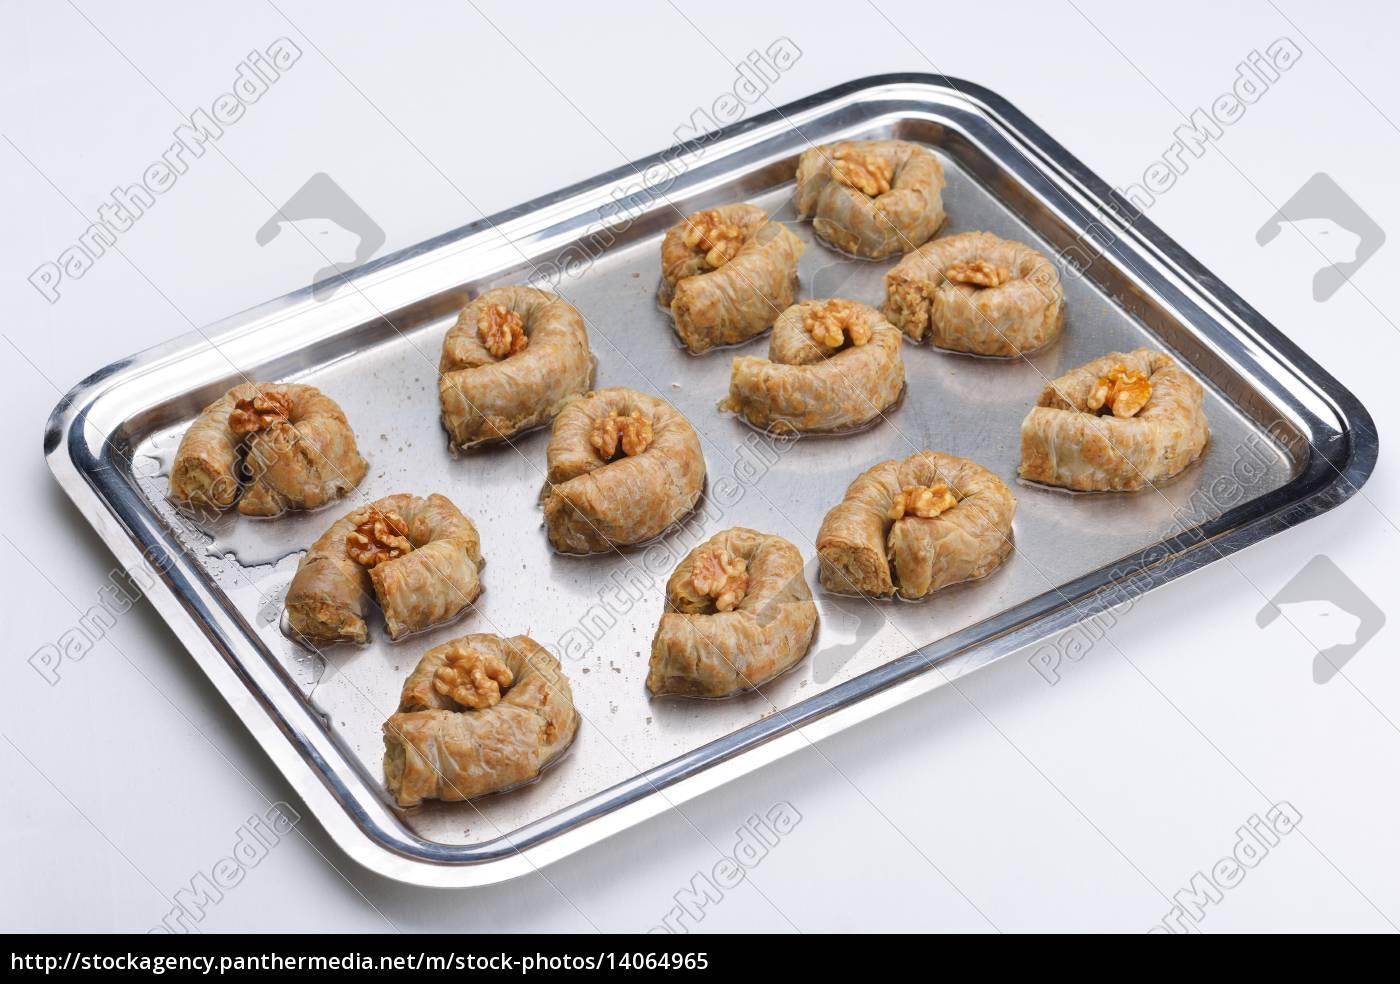 turkish, pastry, kadaif - 14064965